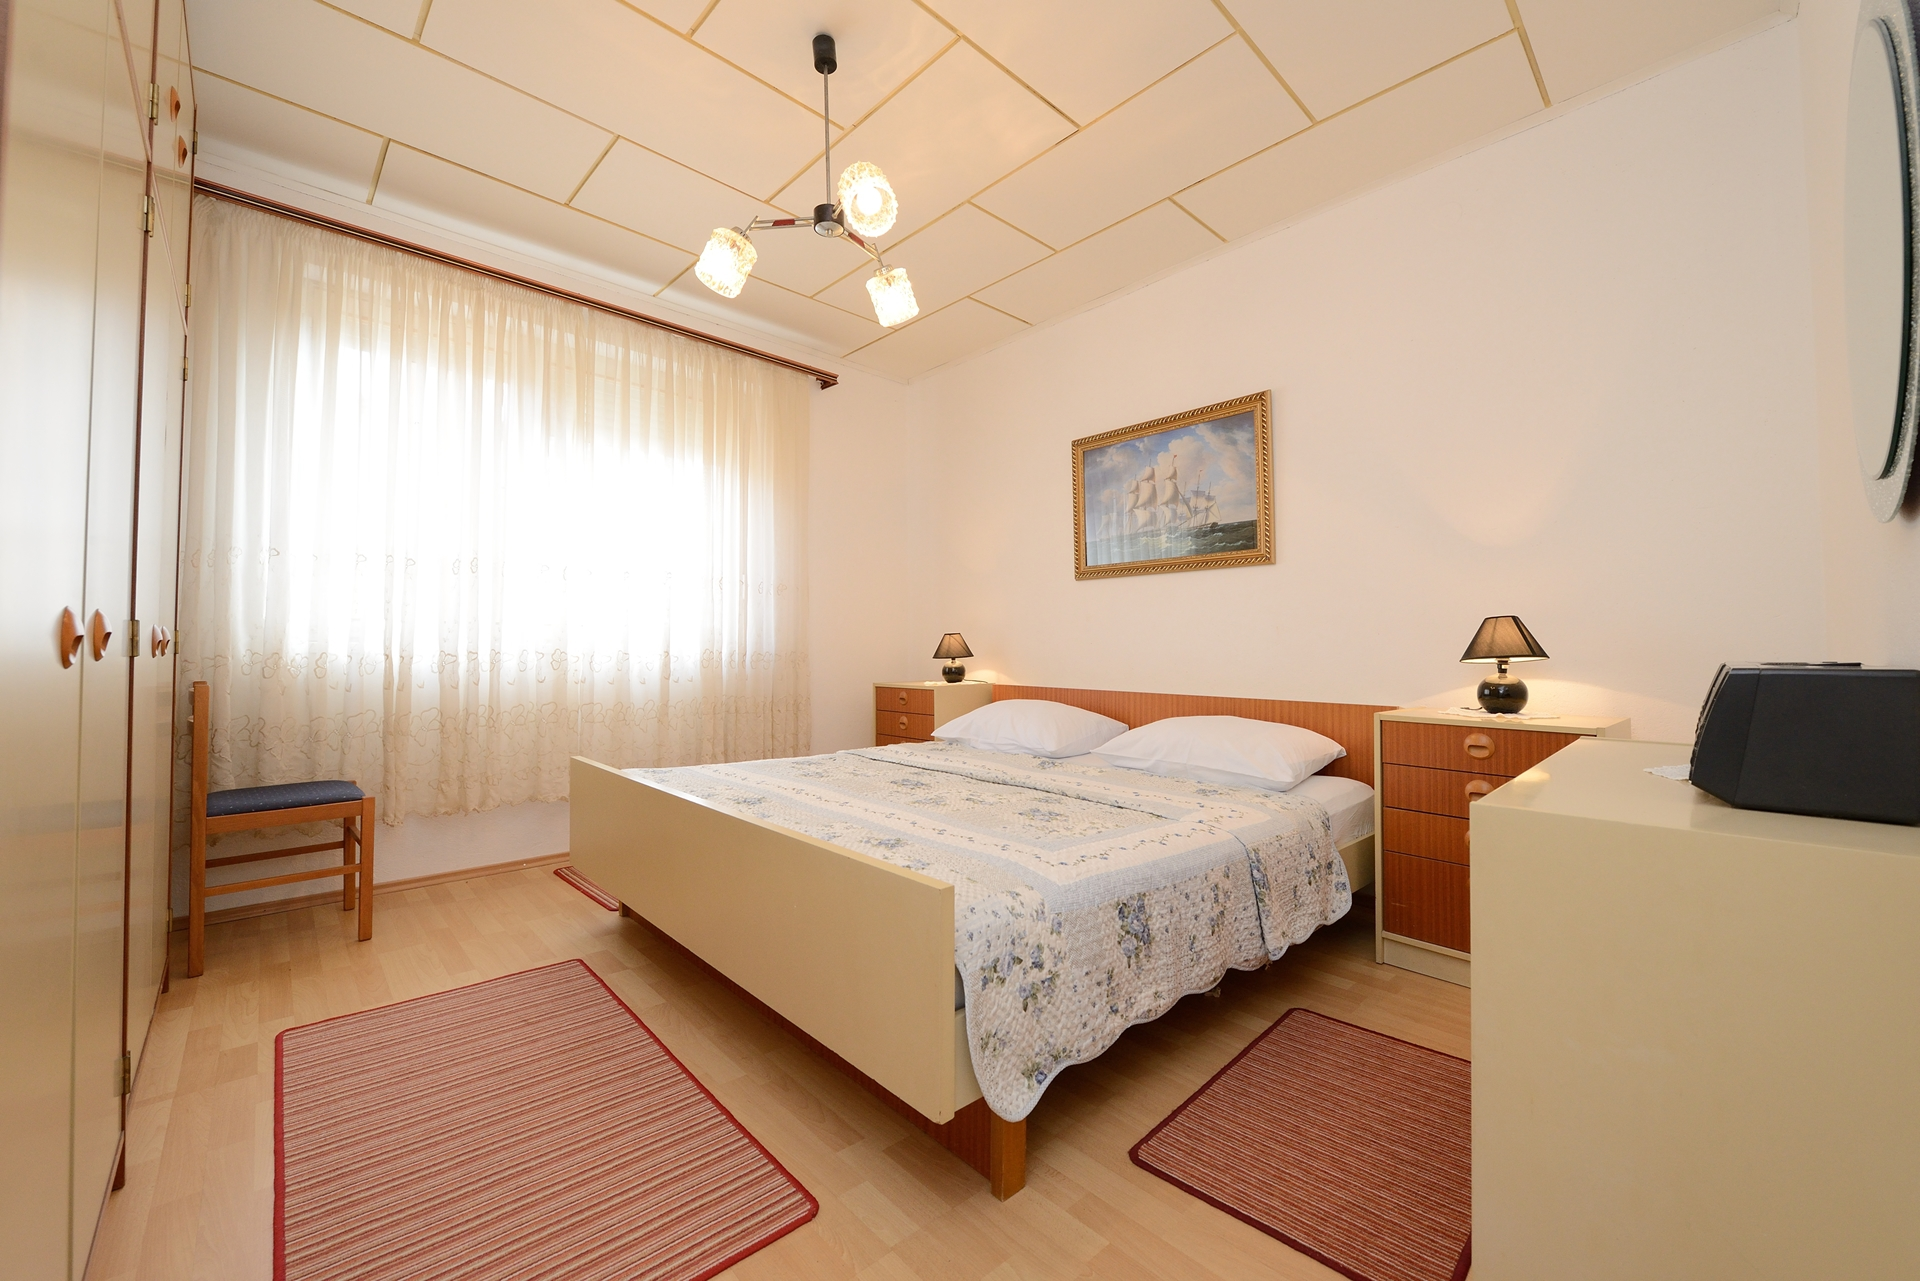 Martin - Lukoran - Vakantiehuizen, villa´s Kroatië - H(8): slaapkamer